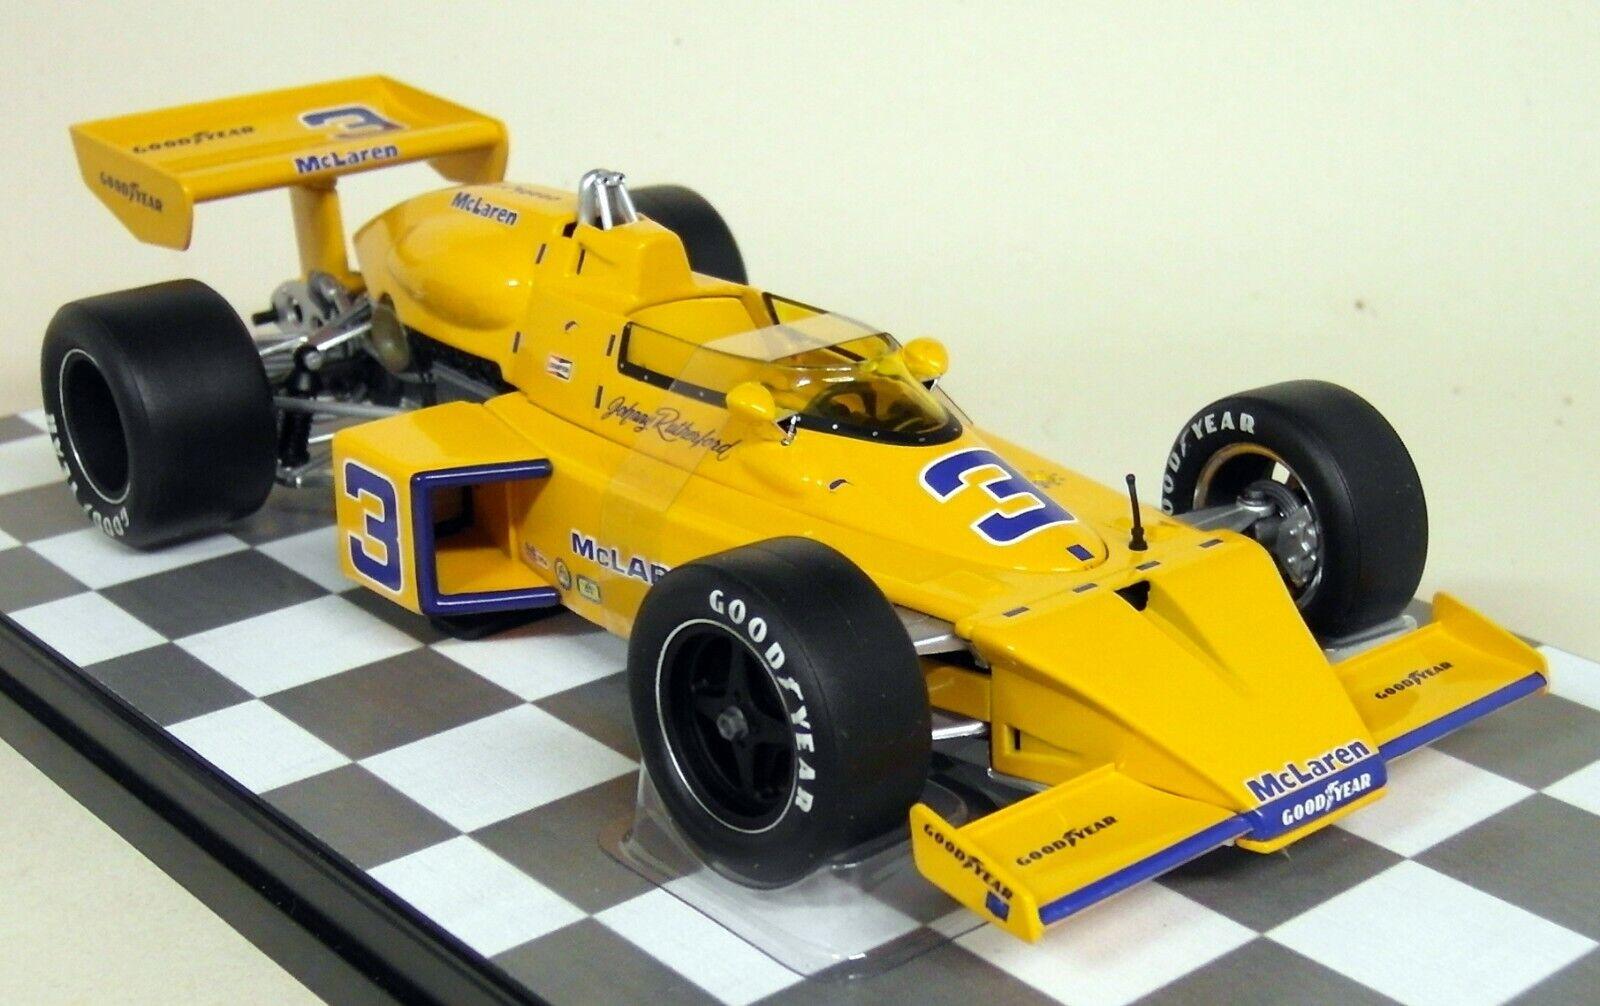 autoousel 1 1 18 SCALA 4801 McLaren M16 1974 miglia di Indianapolis 500 JOHNNY Rutherford